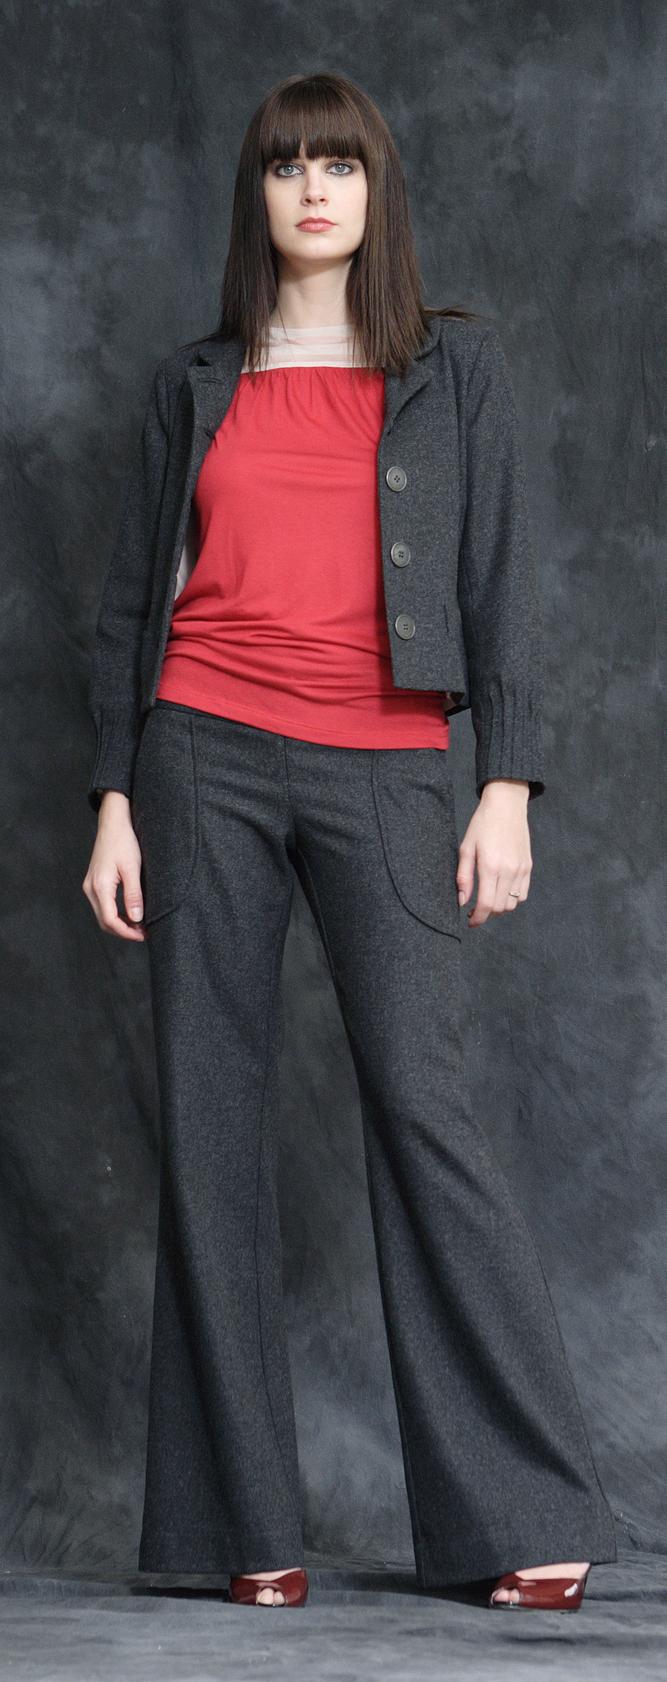 Wool Flannel Cropped Pin Tuck Jacket Lined in Silk  Jersey Bateau Shell w/ Scarf Belt  Wool Flannel Wide Leg Trousers w/ Quilt Stiched Waist.